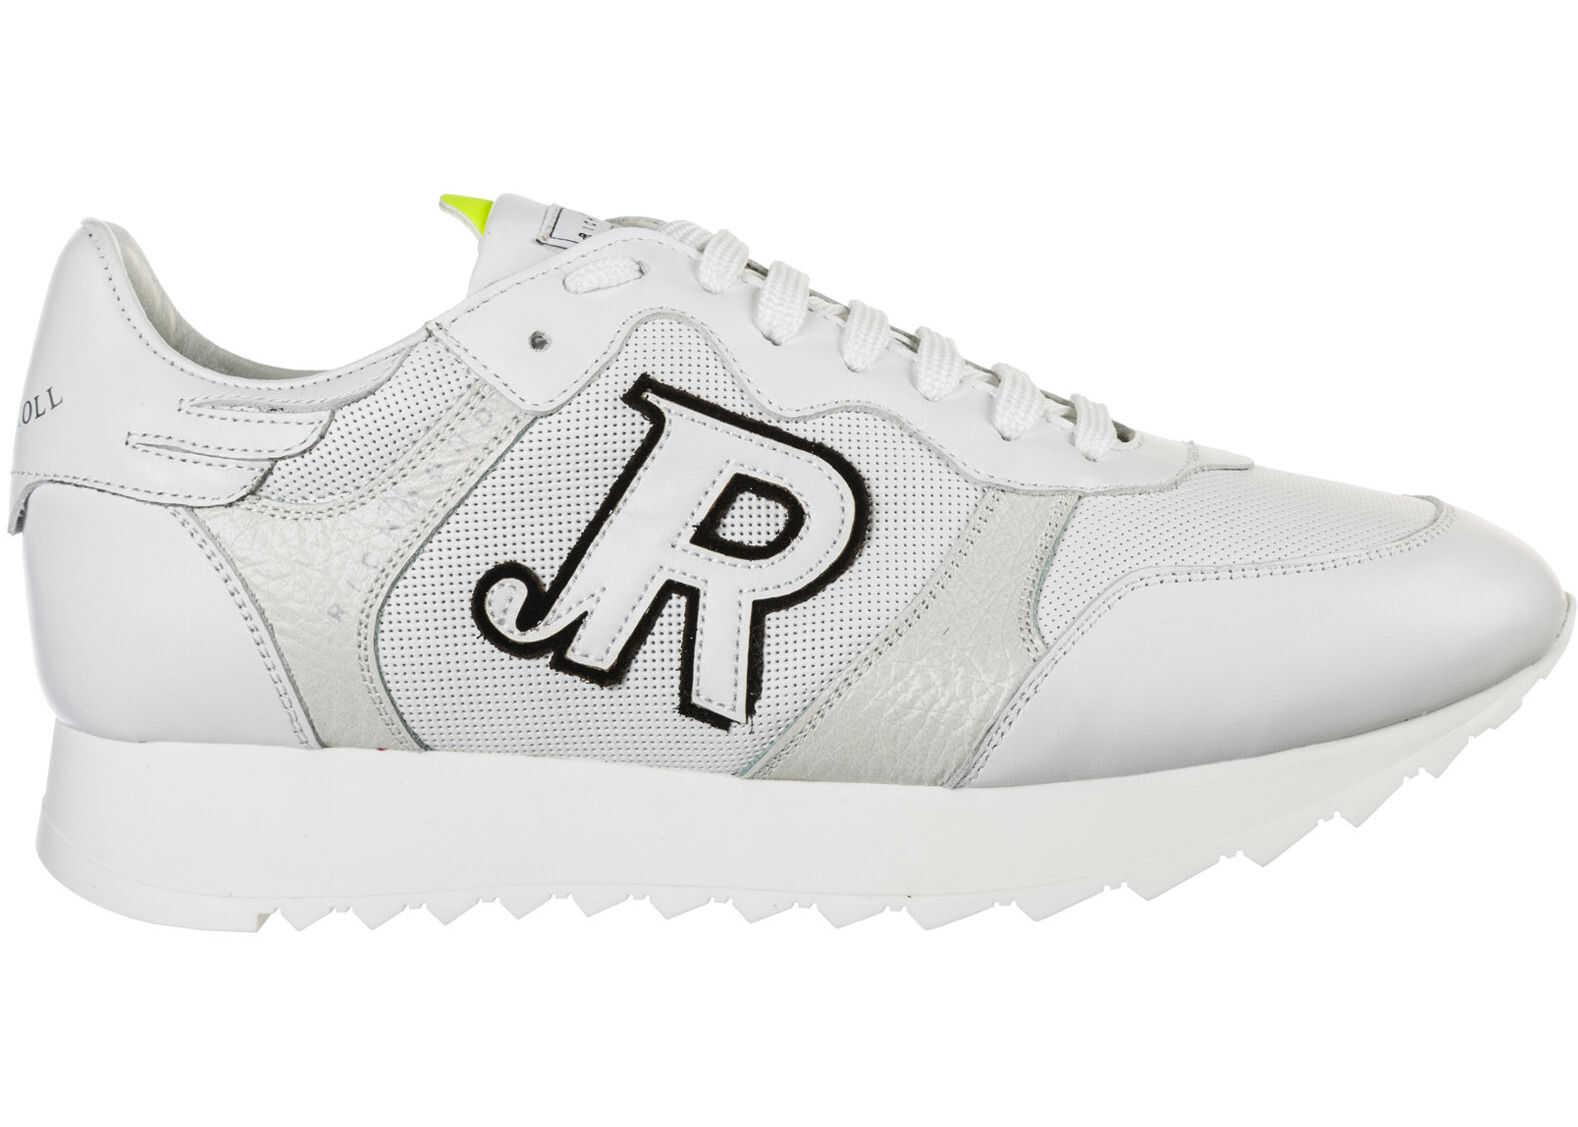 John Richmond Trainers Sneakers White